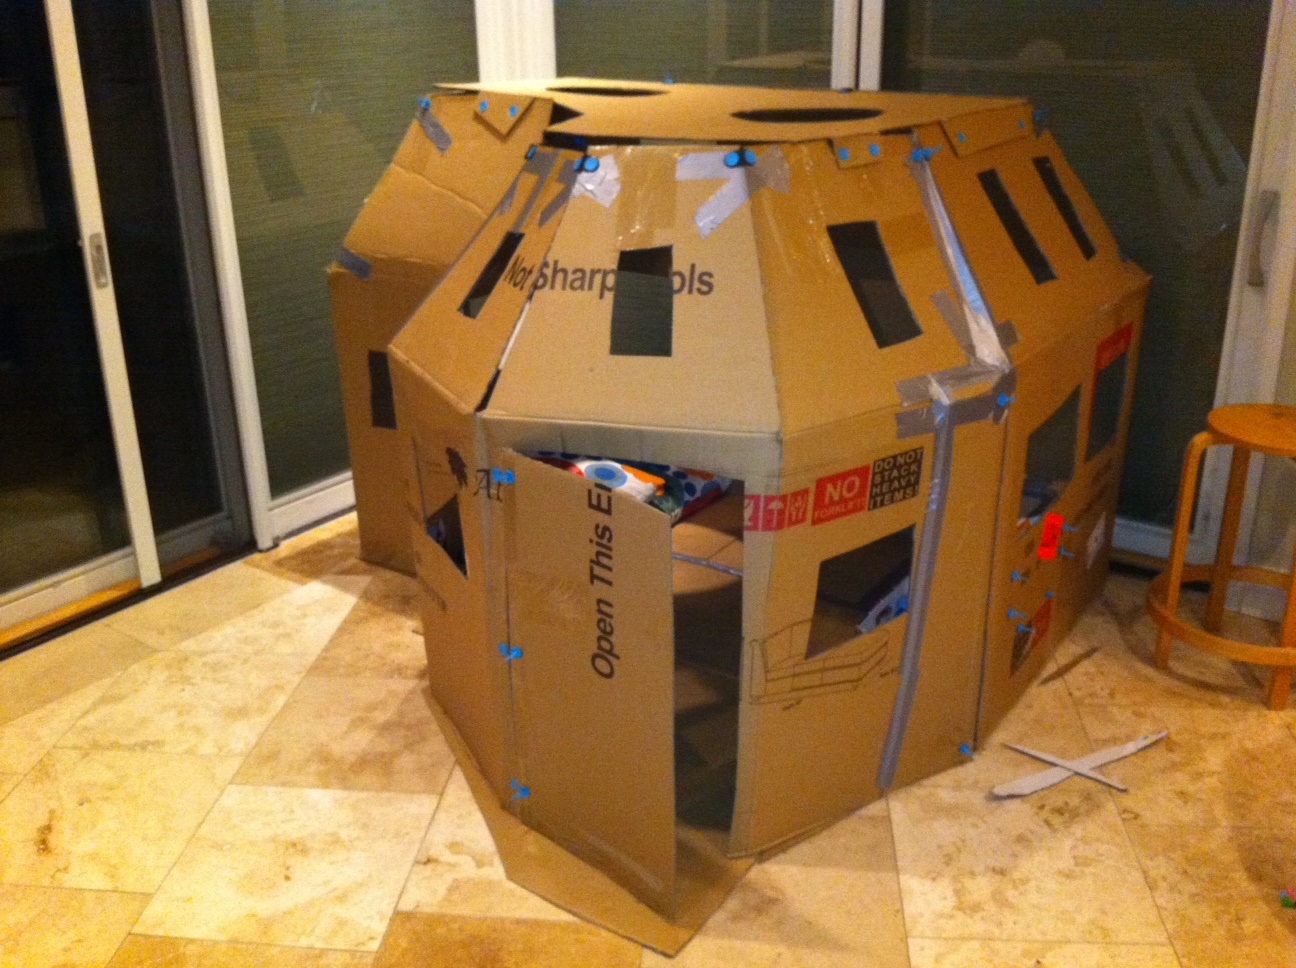 claire creates cardboard playhouse v2 0. Black Bedroom Furniture Sets. Home Design Ideas